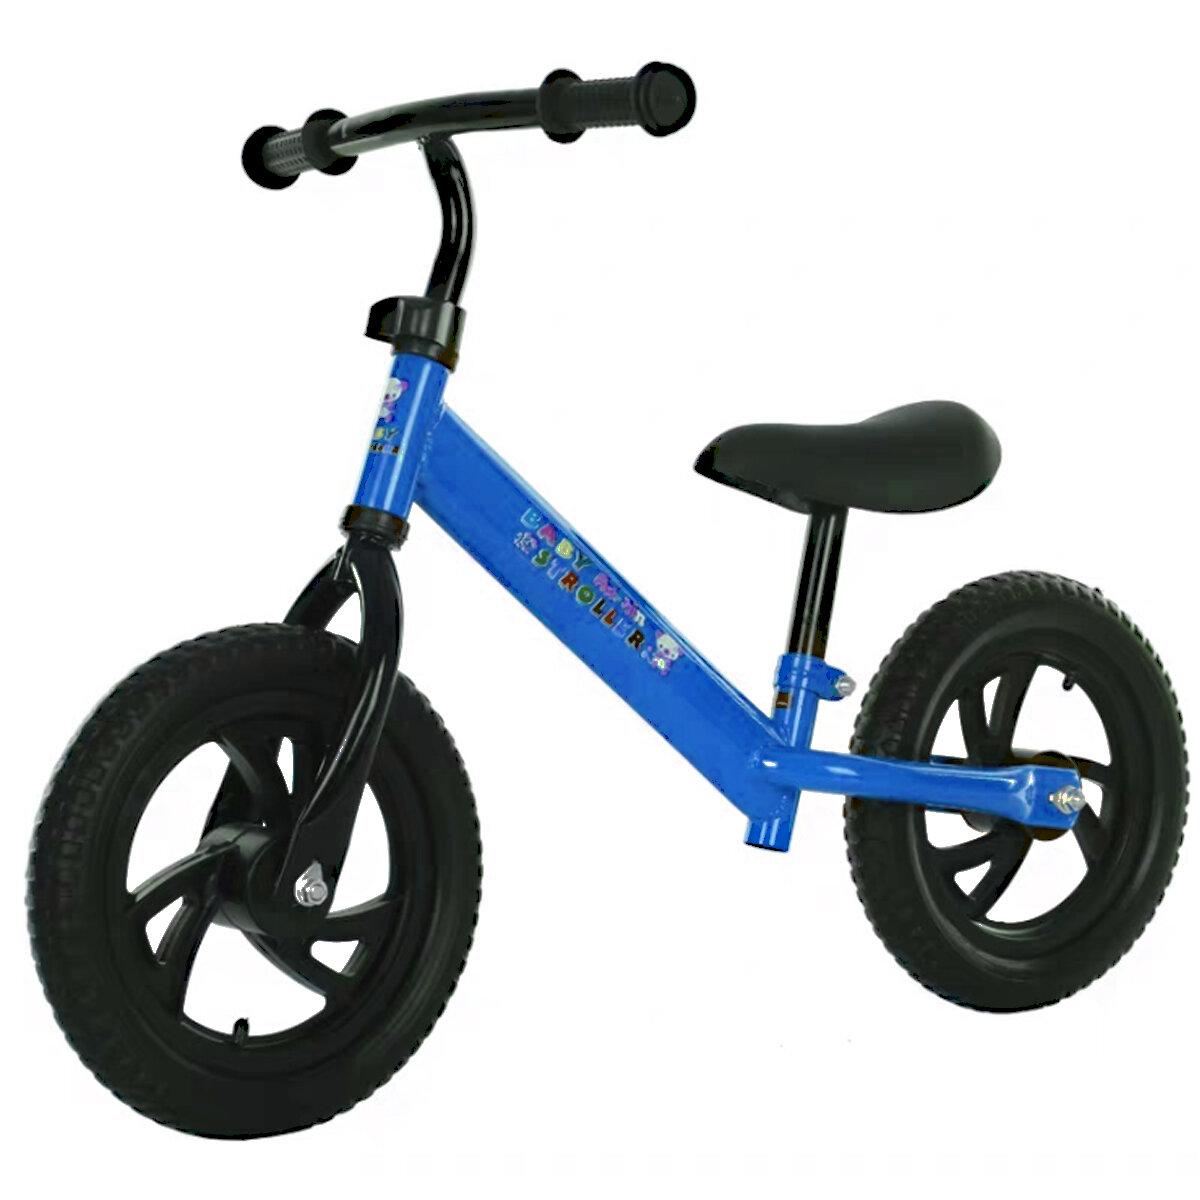 12inch Kids Bike No Pedals Adjustable Children Toddler Training Riding Walking Toys